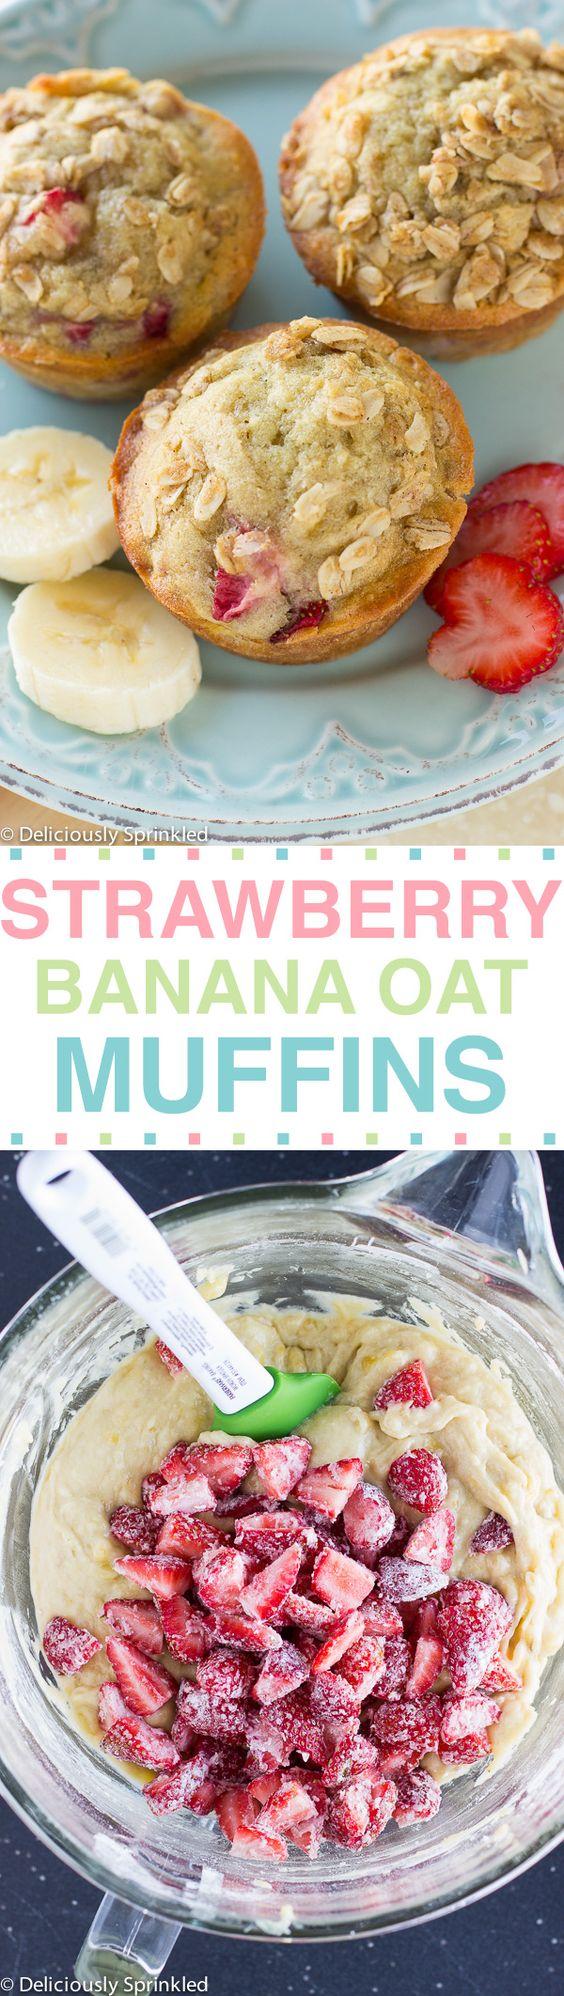 Banana oat muffins, Frozen and Oat muffins on Pinterest